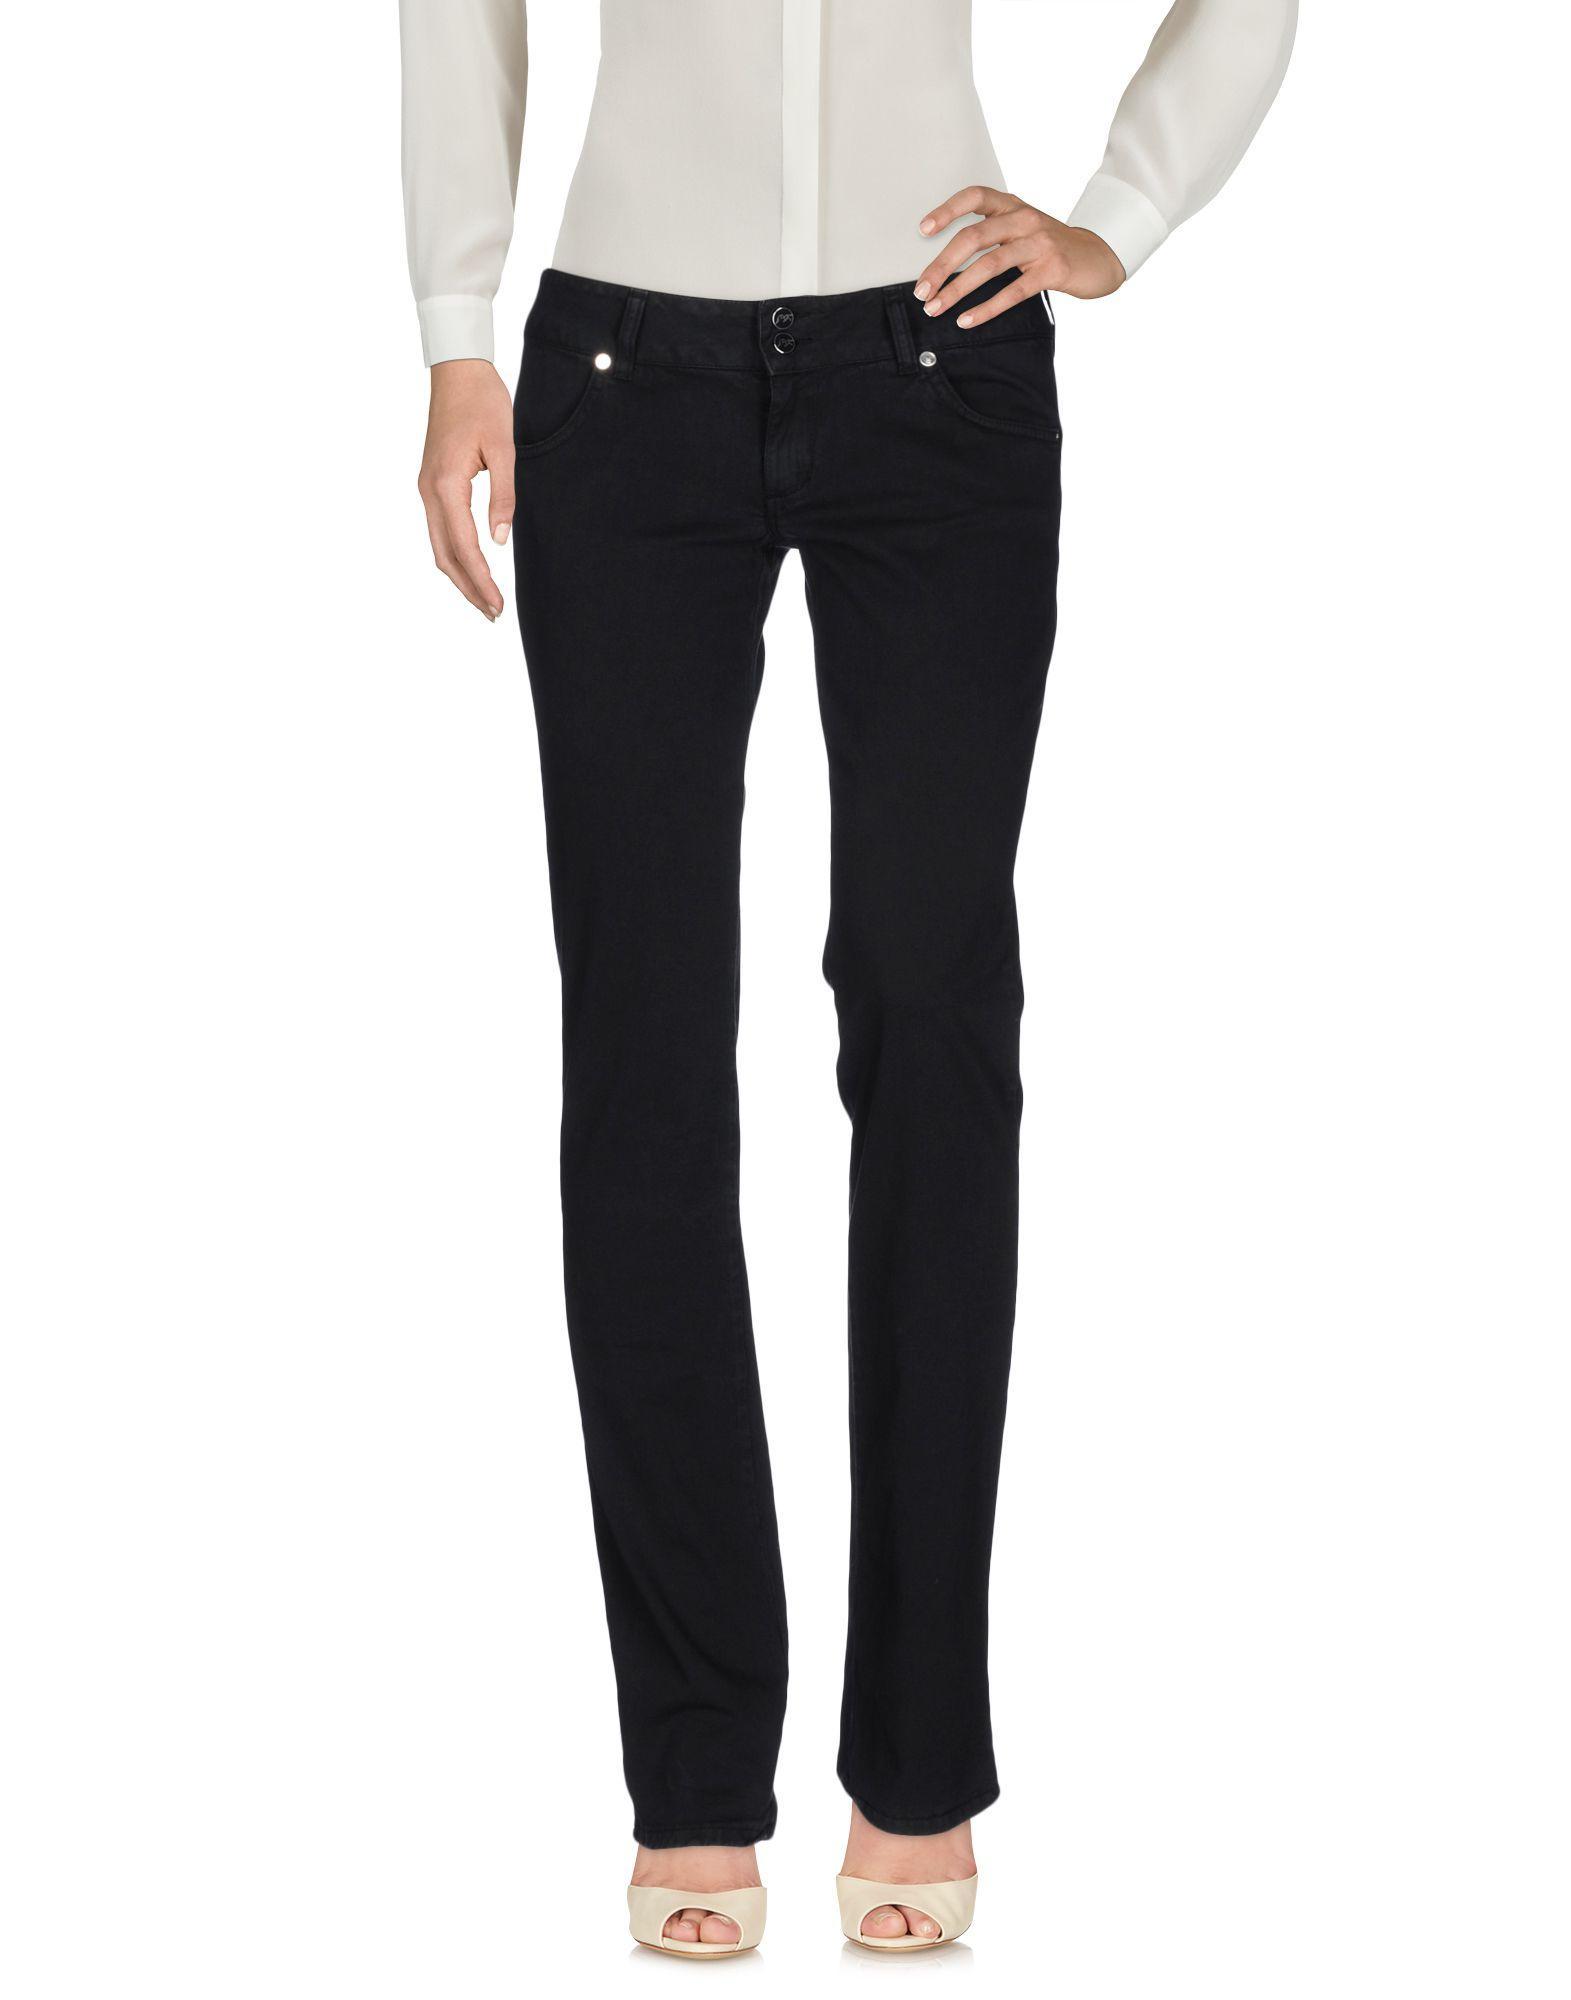 Liu •jo Casual Pants In Black